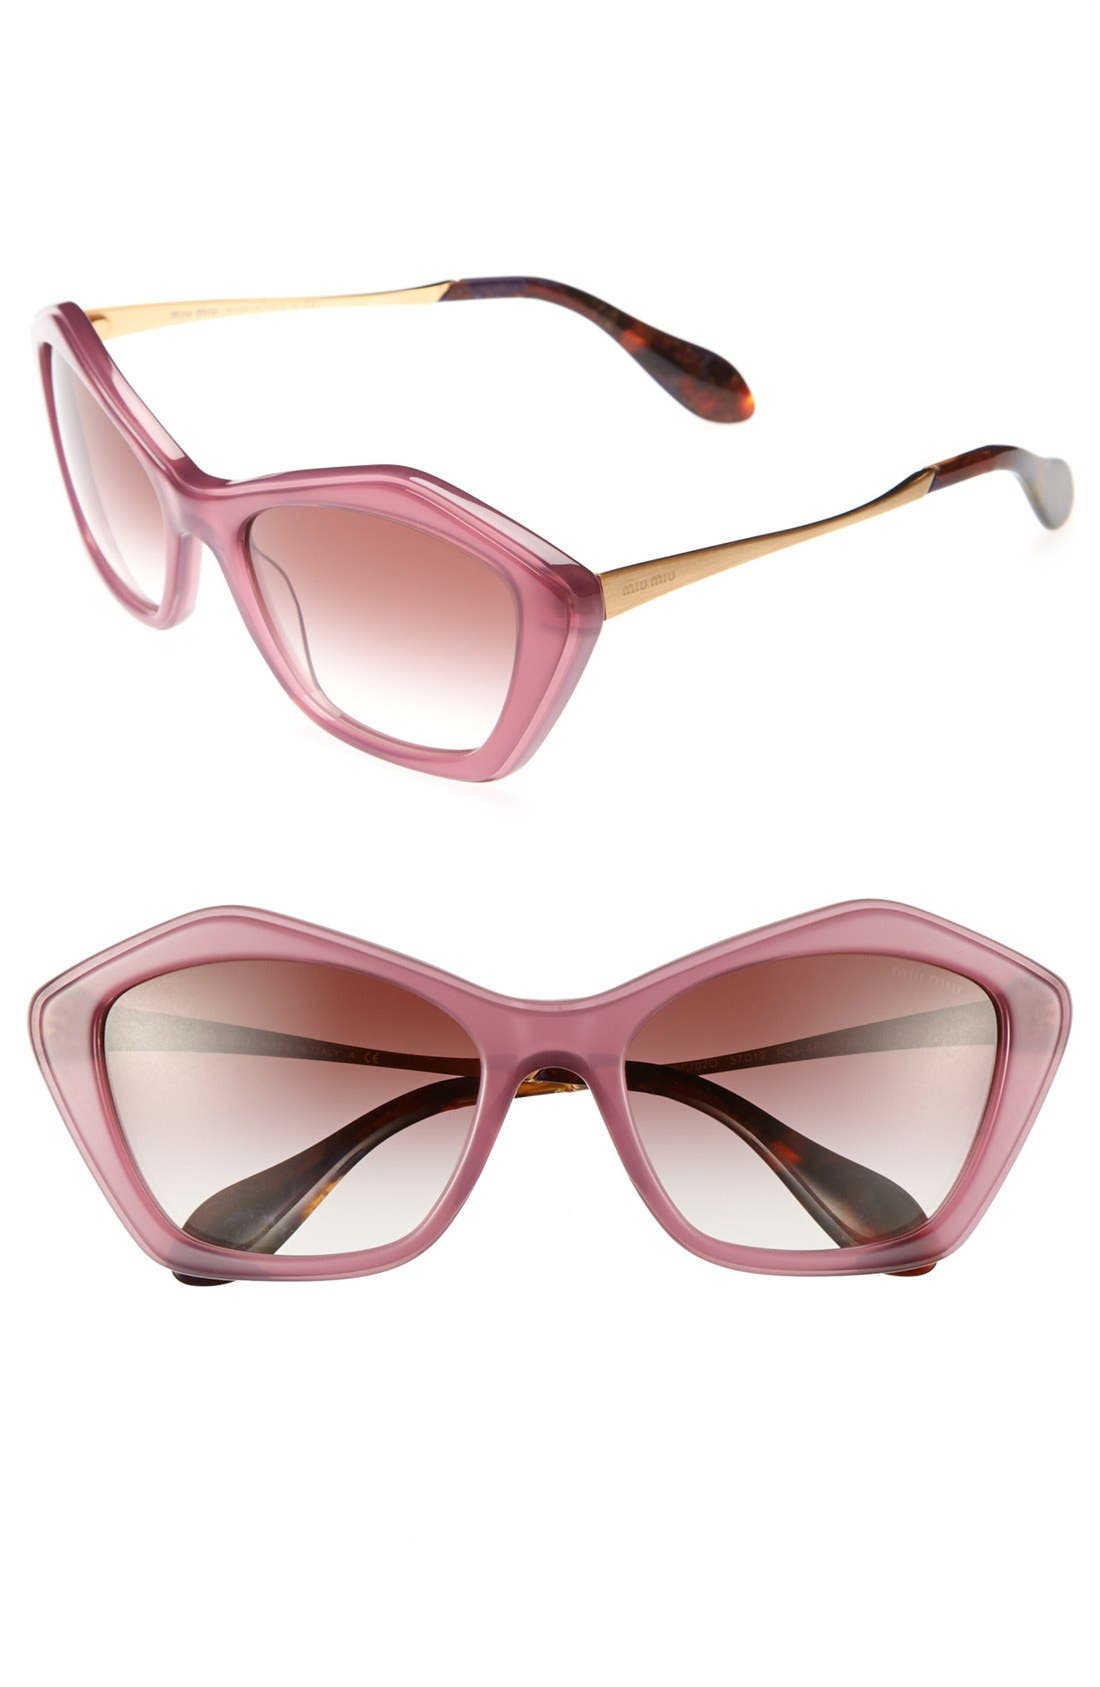 Main Image - Miu Miu Angled 57mm Sunglasses